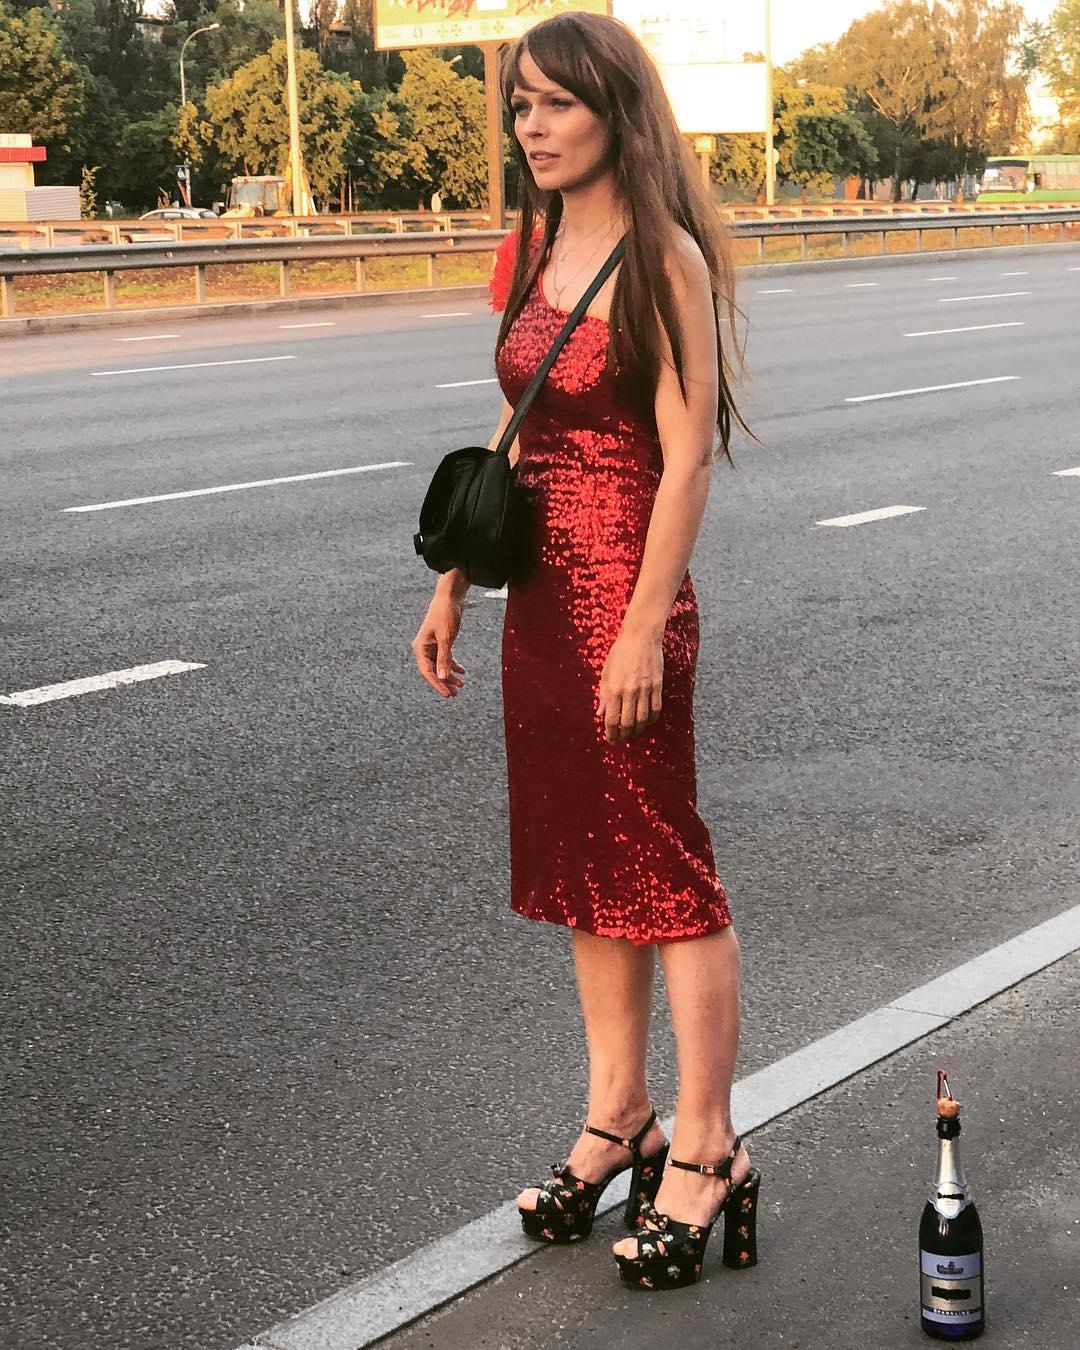 Снимают проституток на трассе в москве видео #9